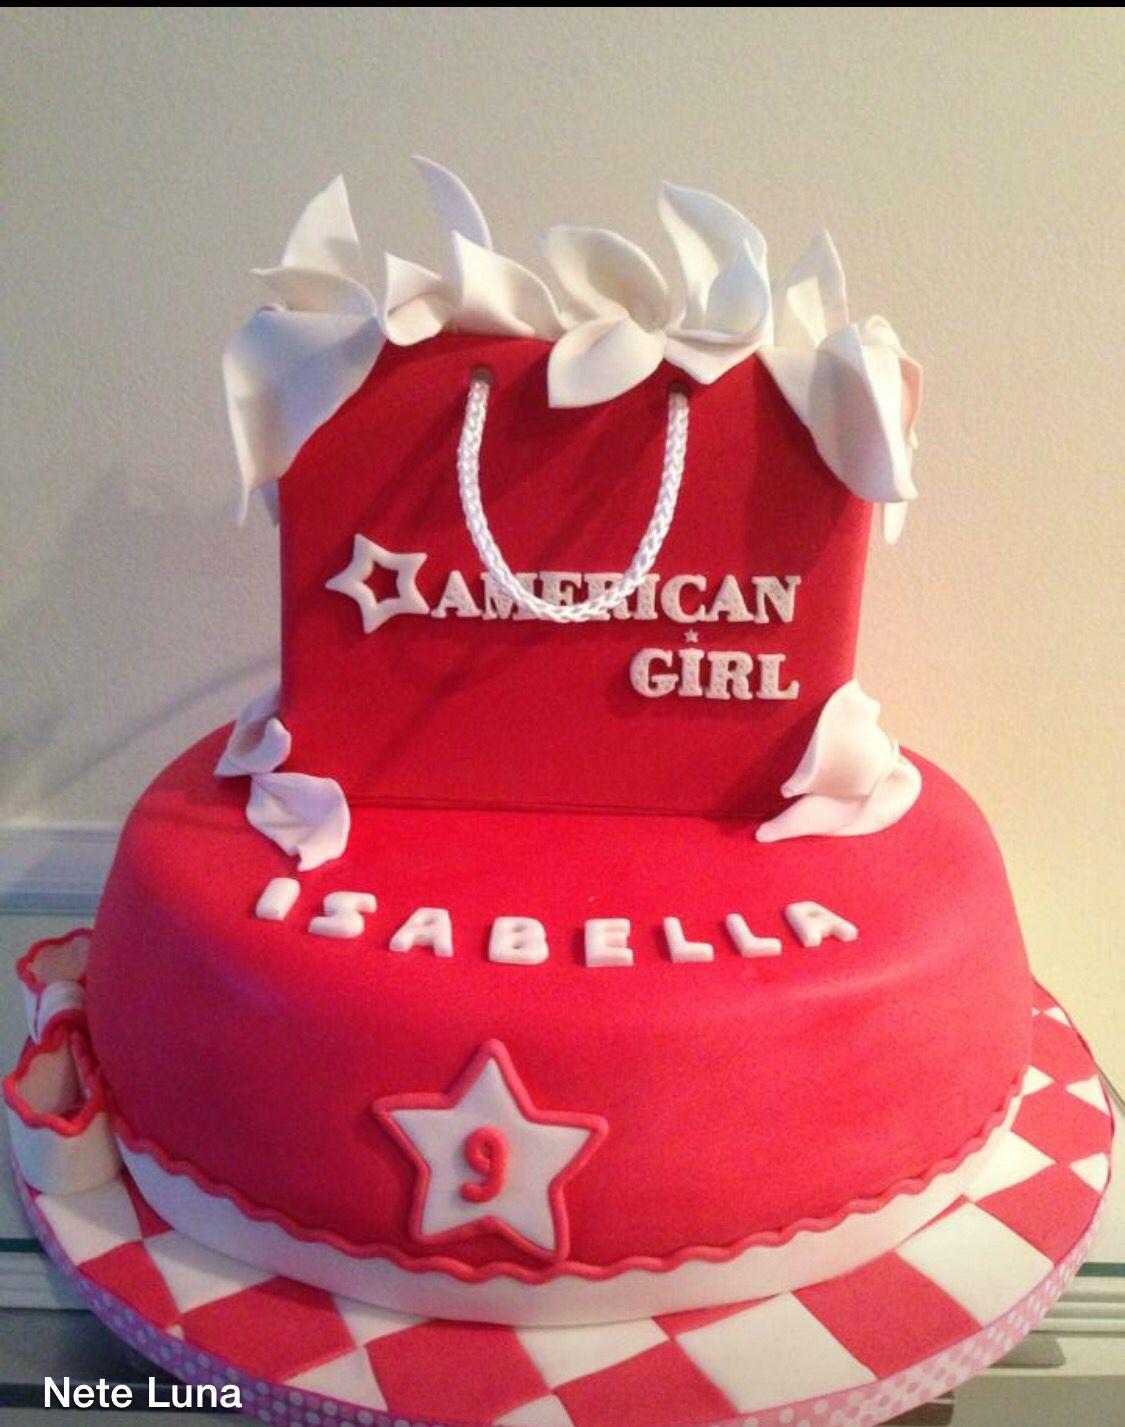 Enjoyable American Girlscake With Images American Girl Birthday Party Funny Birthday Cards Online Elaedamsfinfo